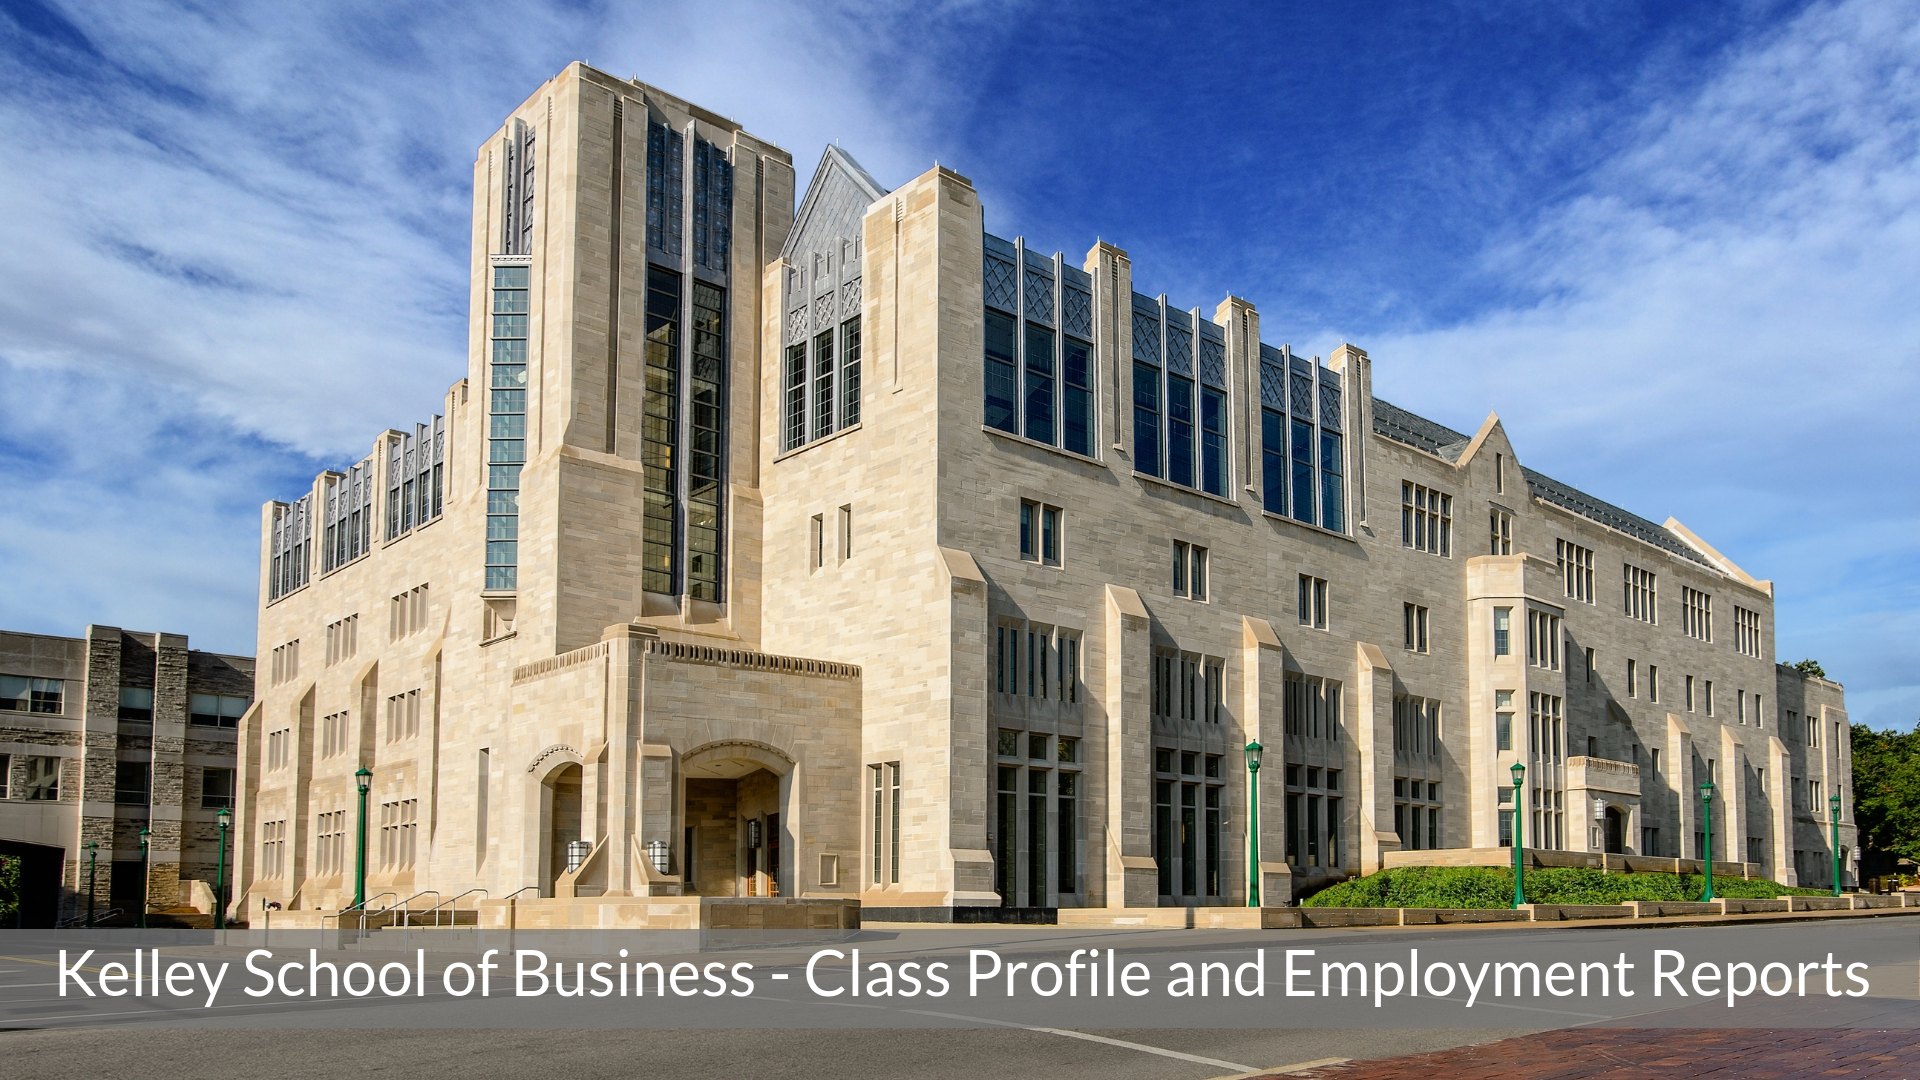 Indiana University Kelley School of Business - Kelley MBA Program - Class Profile, Employment Reports and Notable Alumni